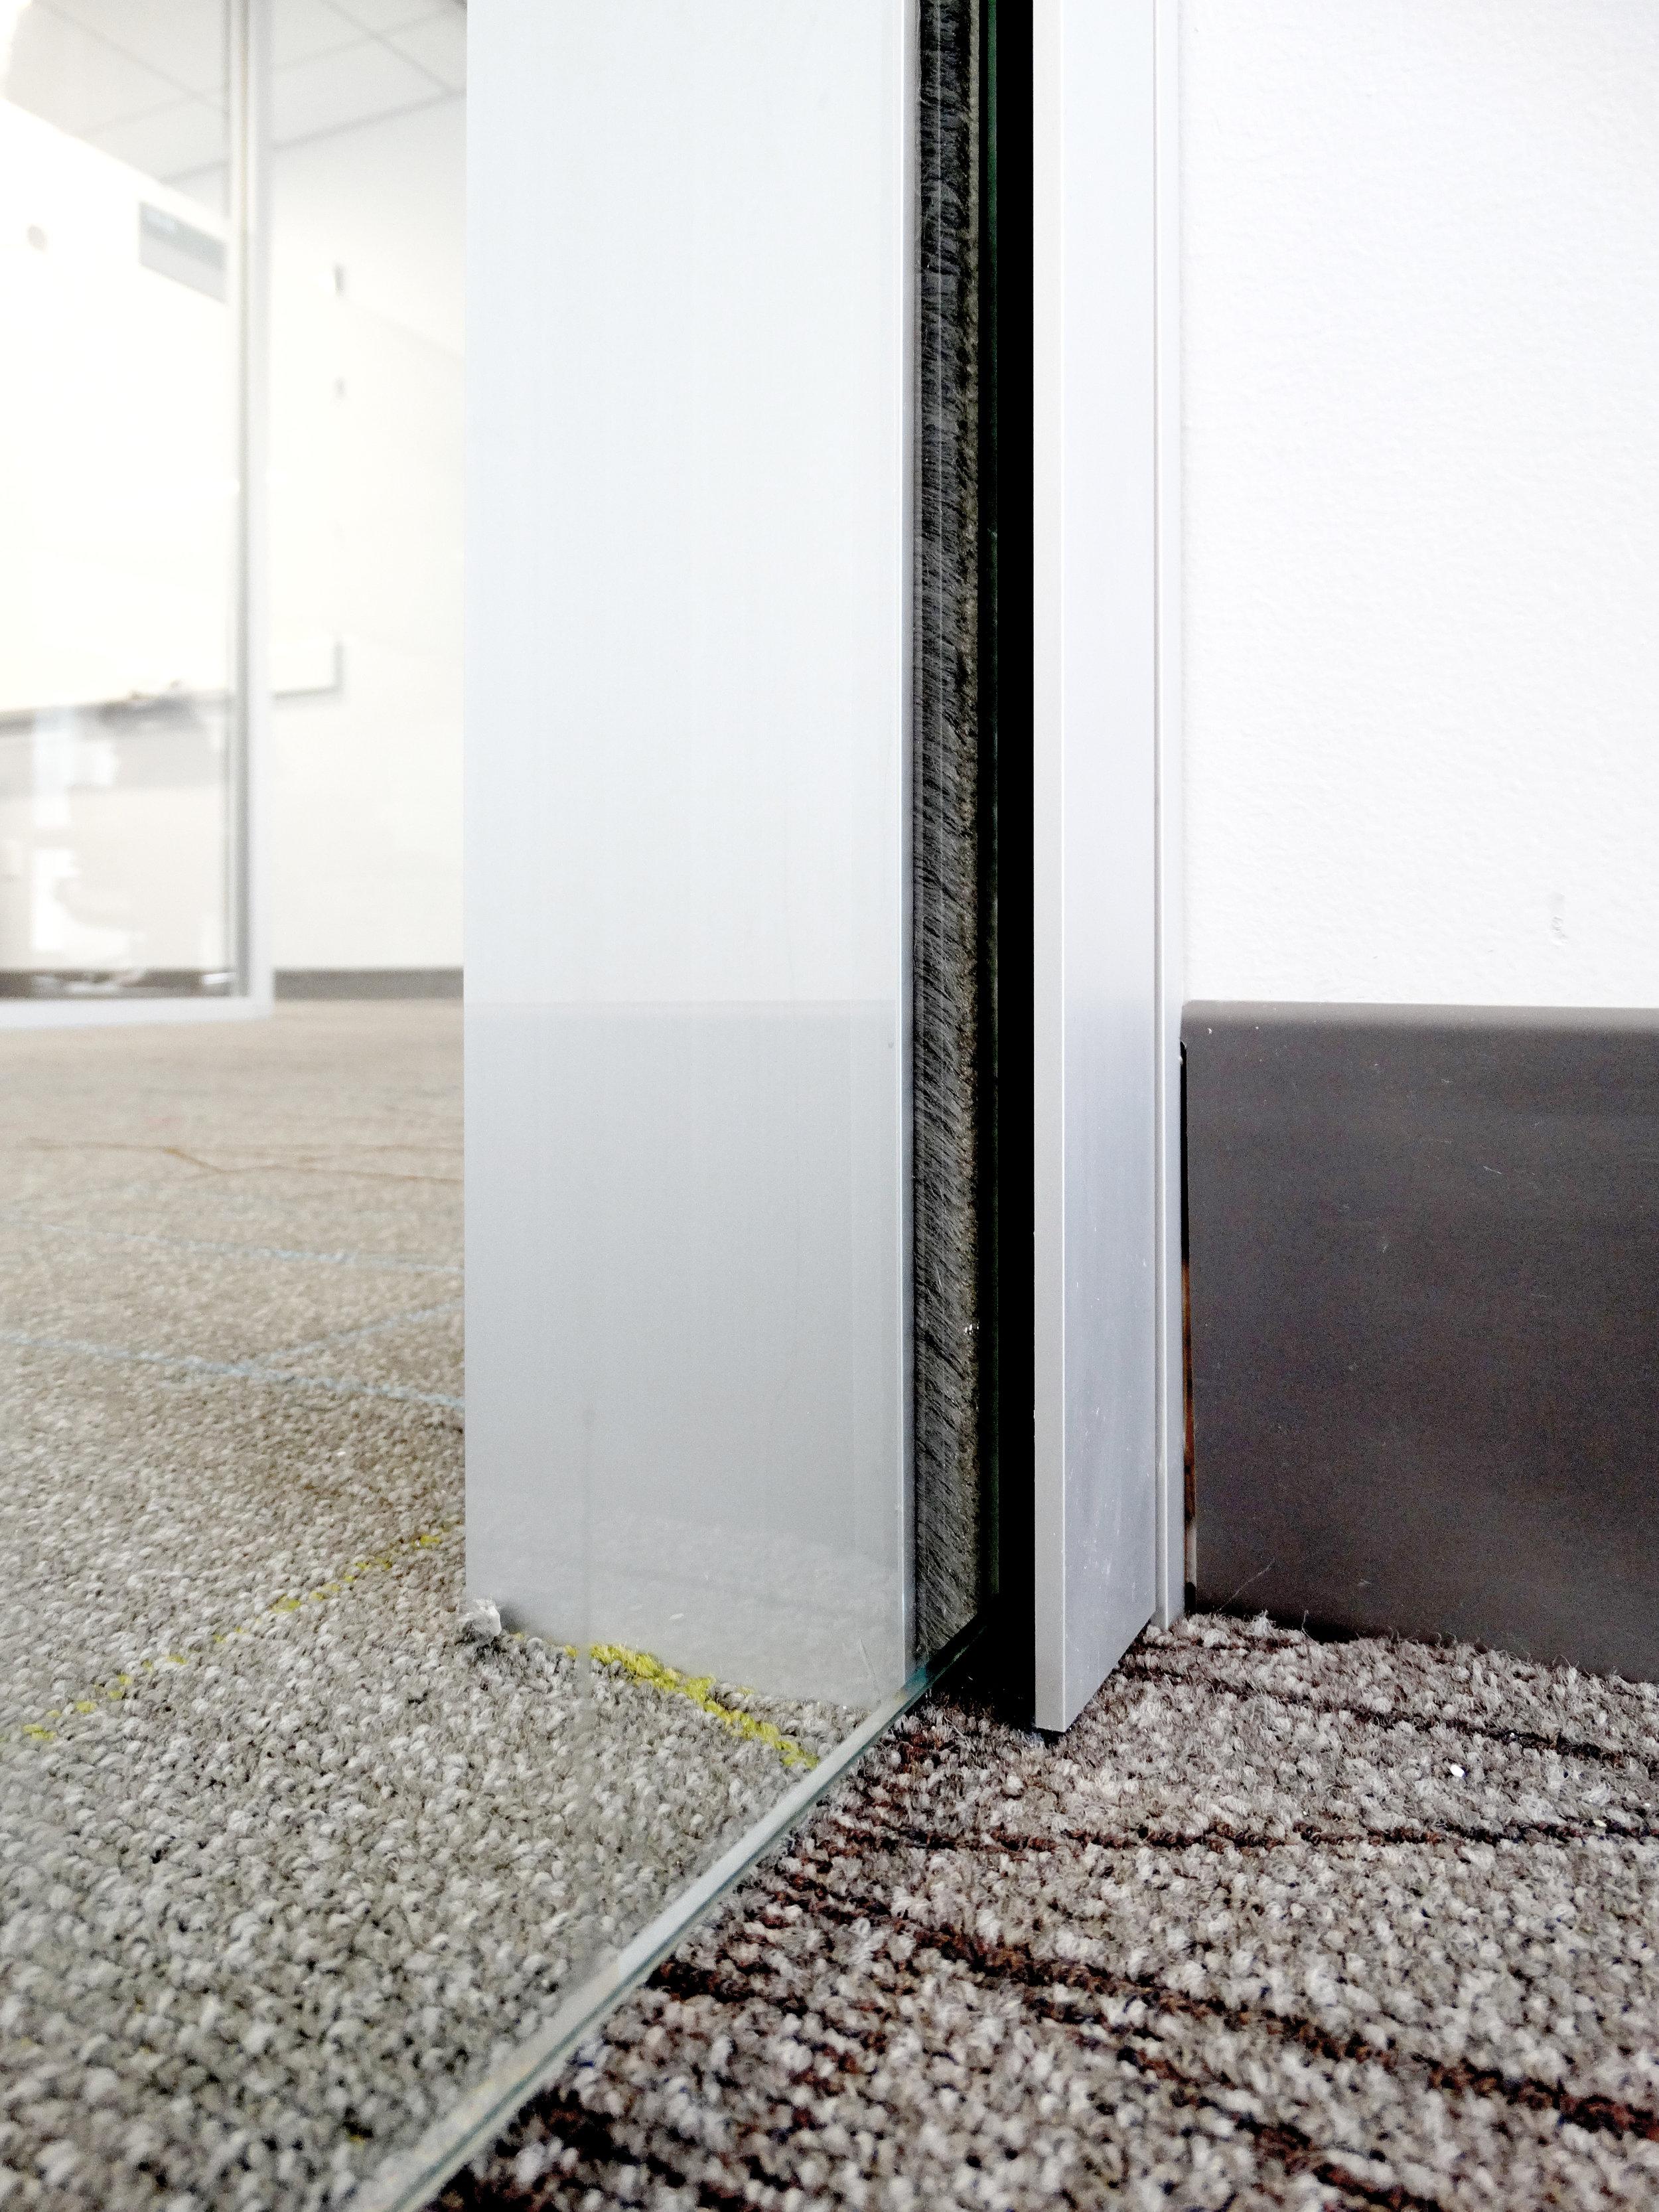 Litespace Frameless Glass Sliding Door Receiving Channel - Spaceworks AI.jpg